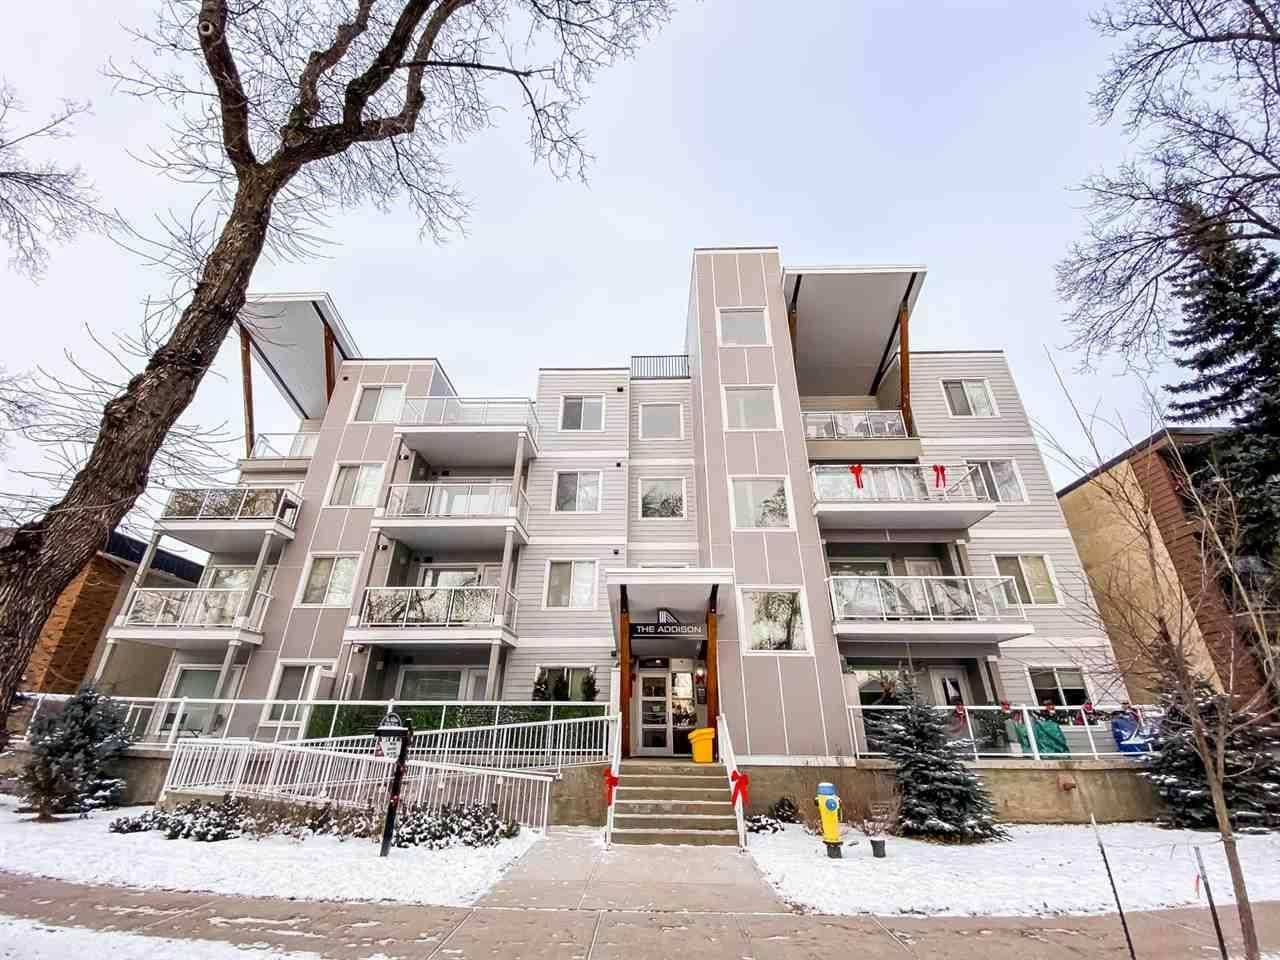 403 - 10030 83 Avenue Nw, Edmonton | Image 2